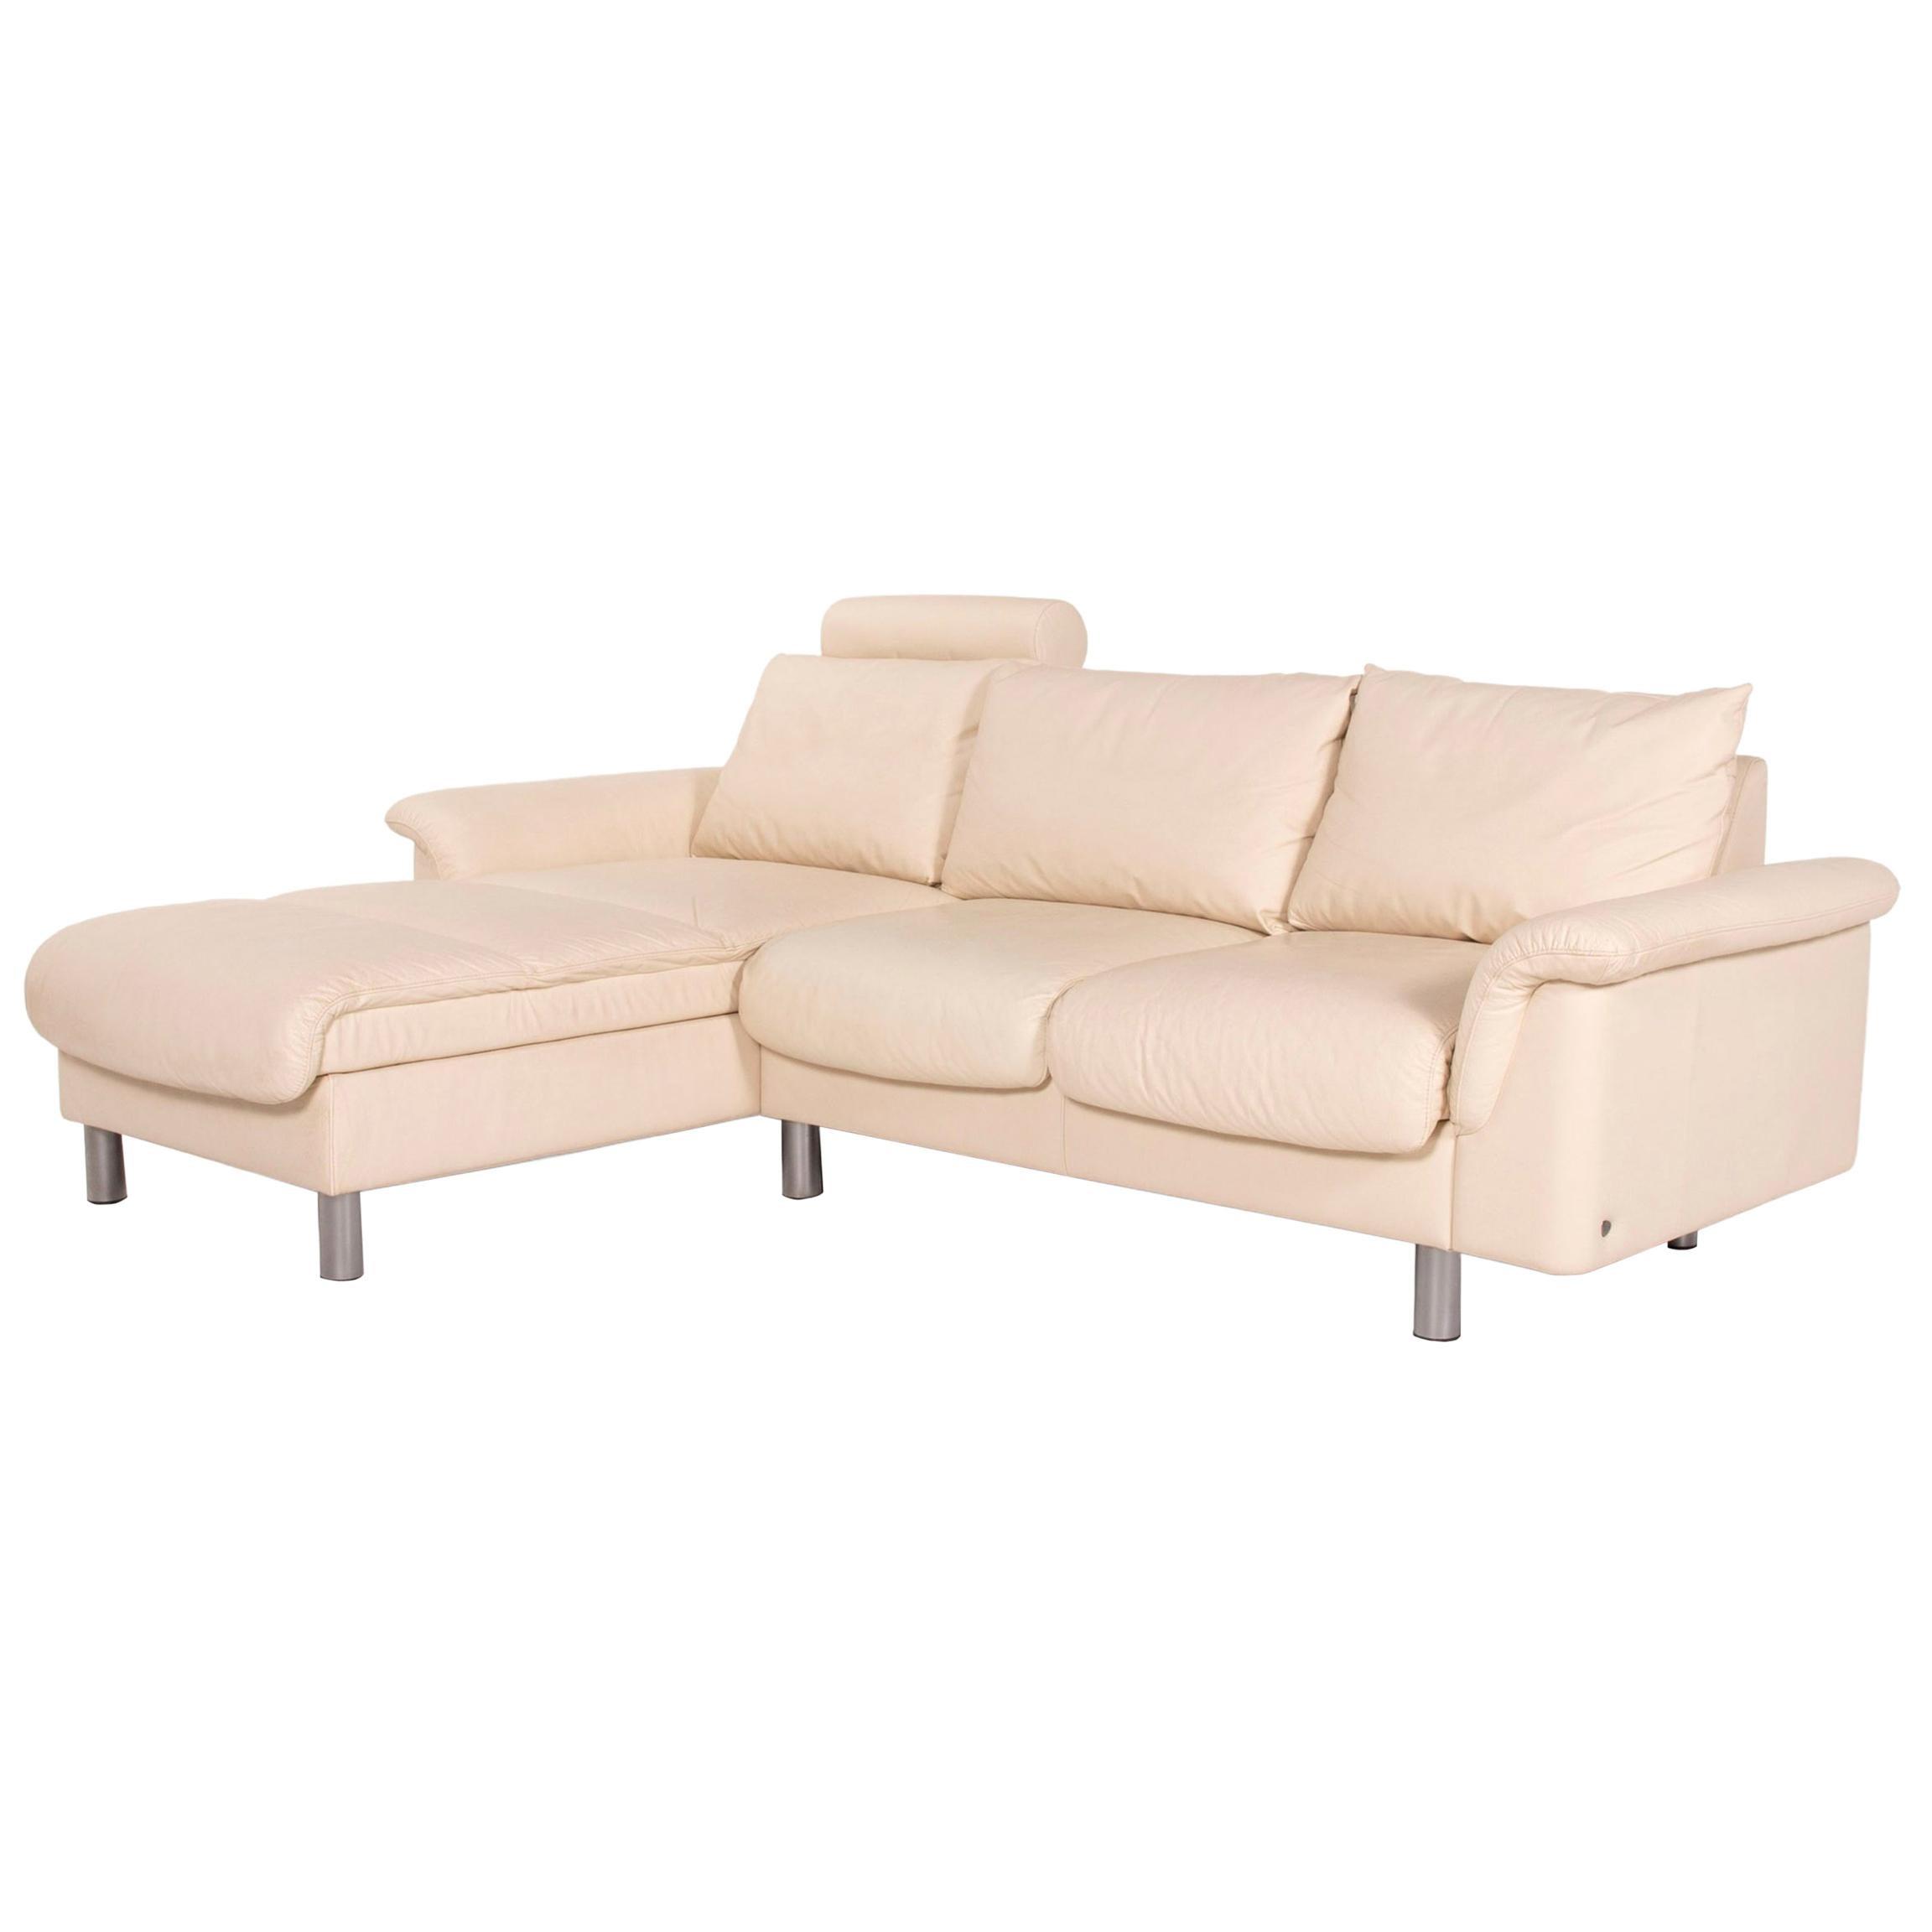 Stressless E300 Leather Corner Sofa Cream Sofa Function Couch